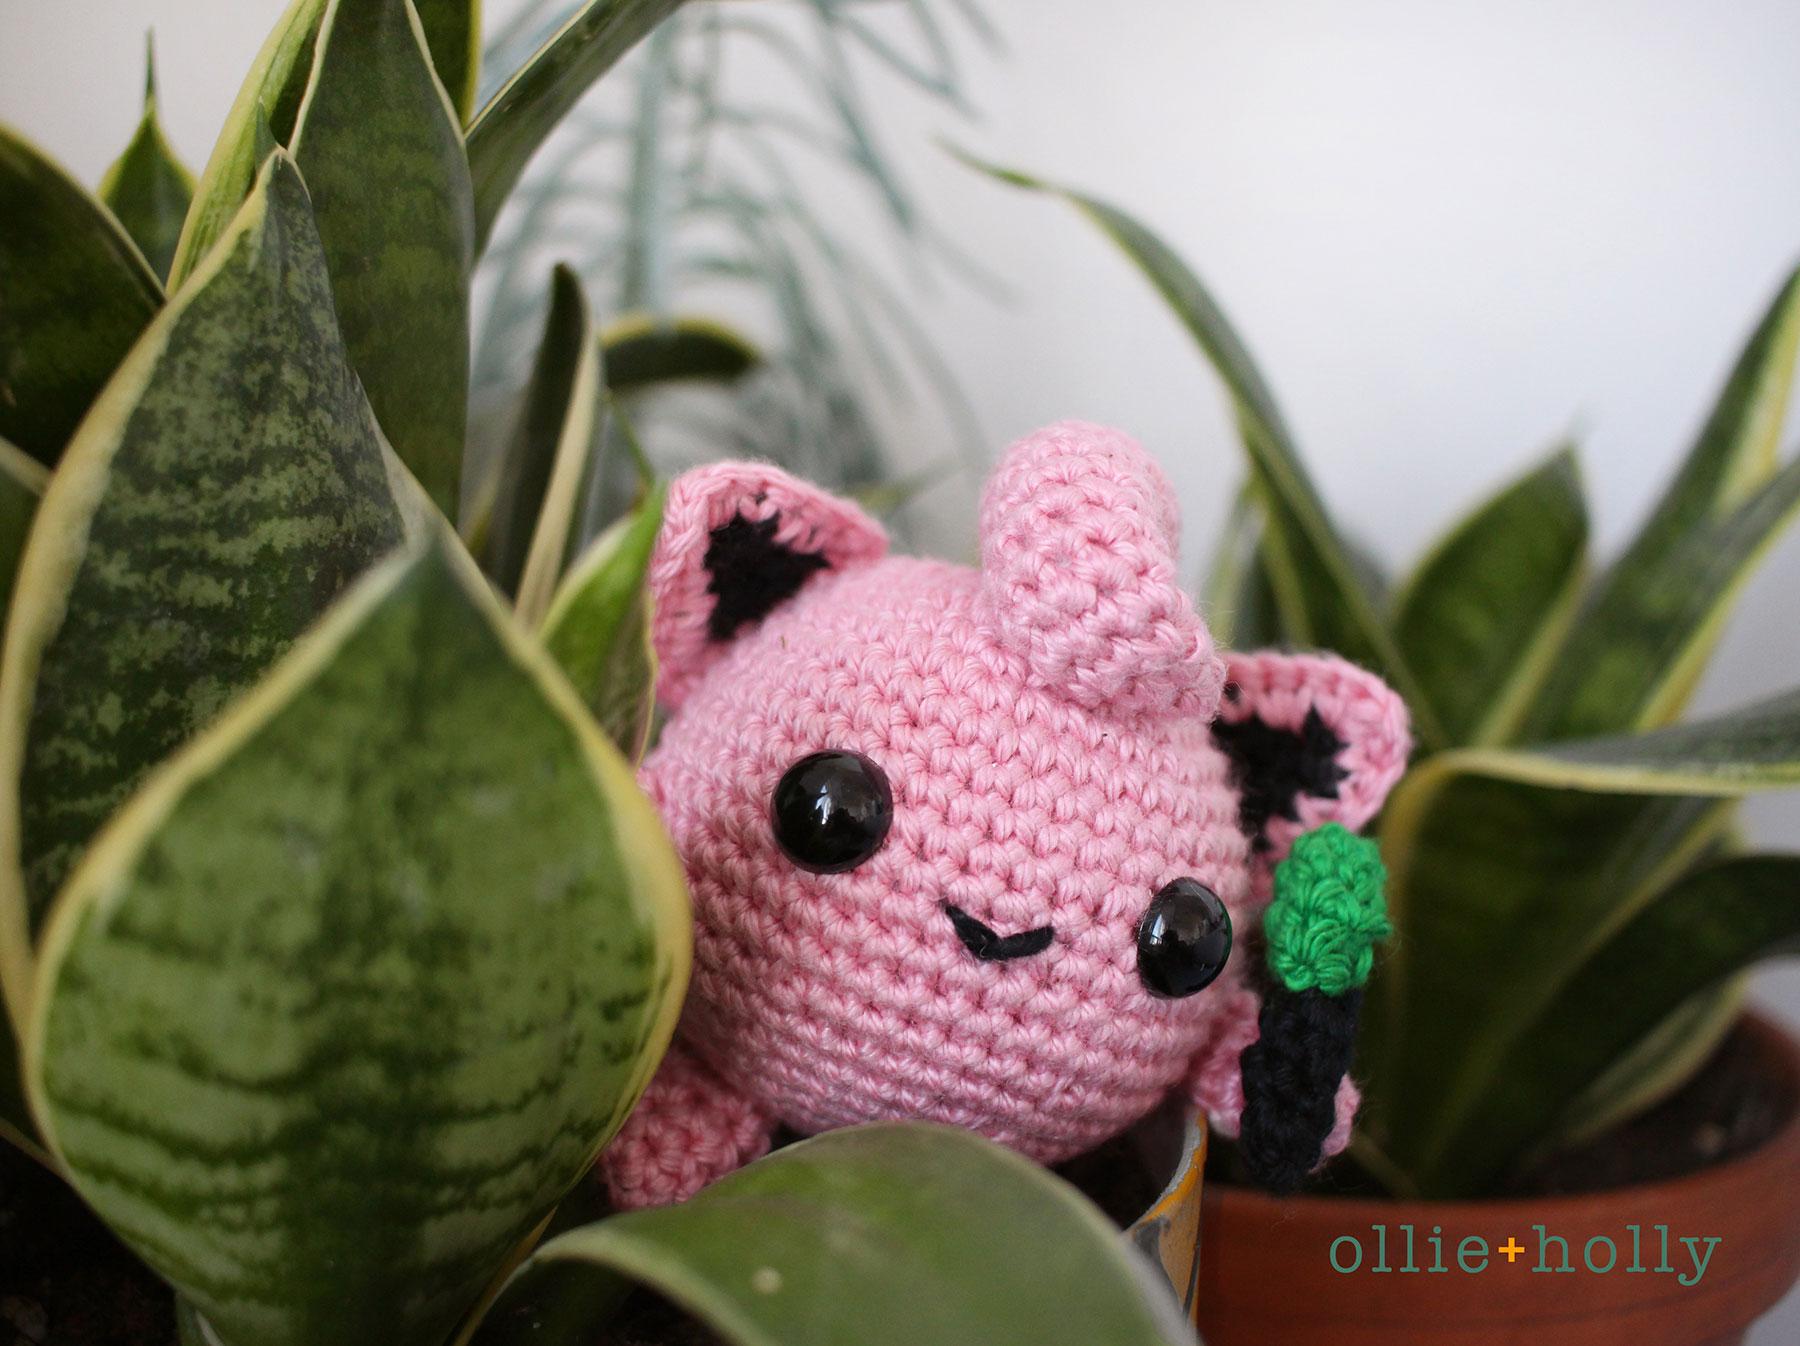 jigglypuff-amigurumi-crochet-pattern-in-bushes.